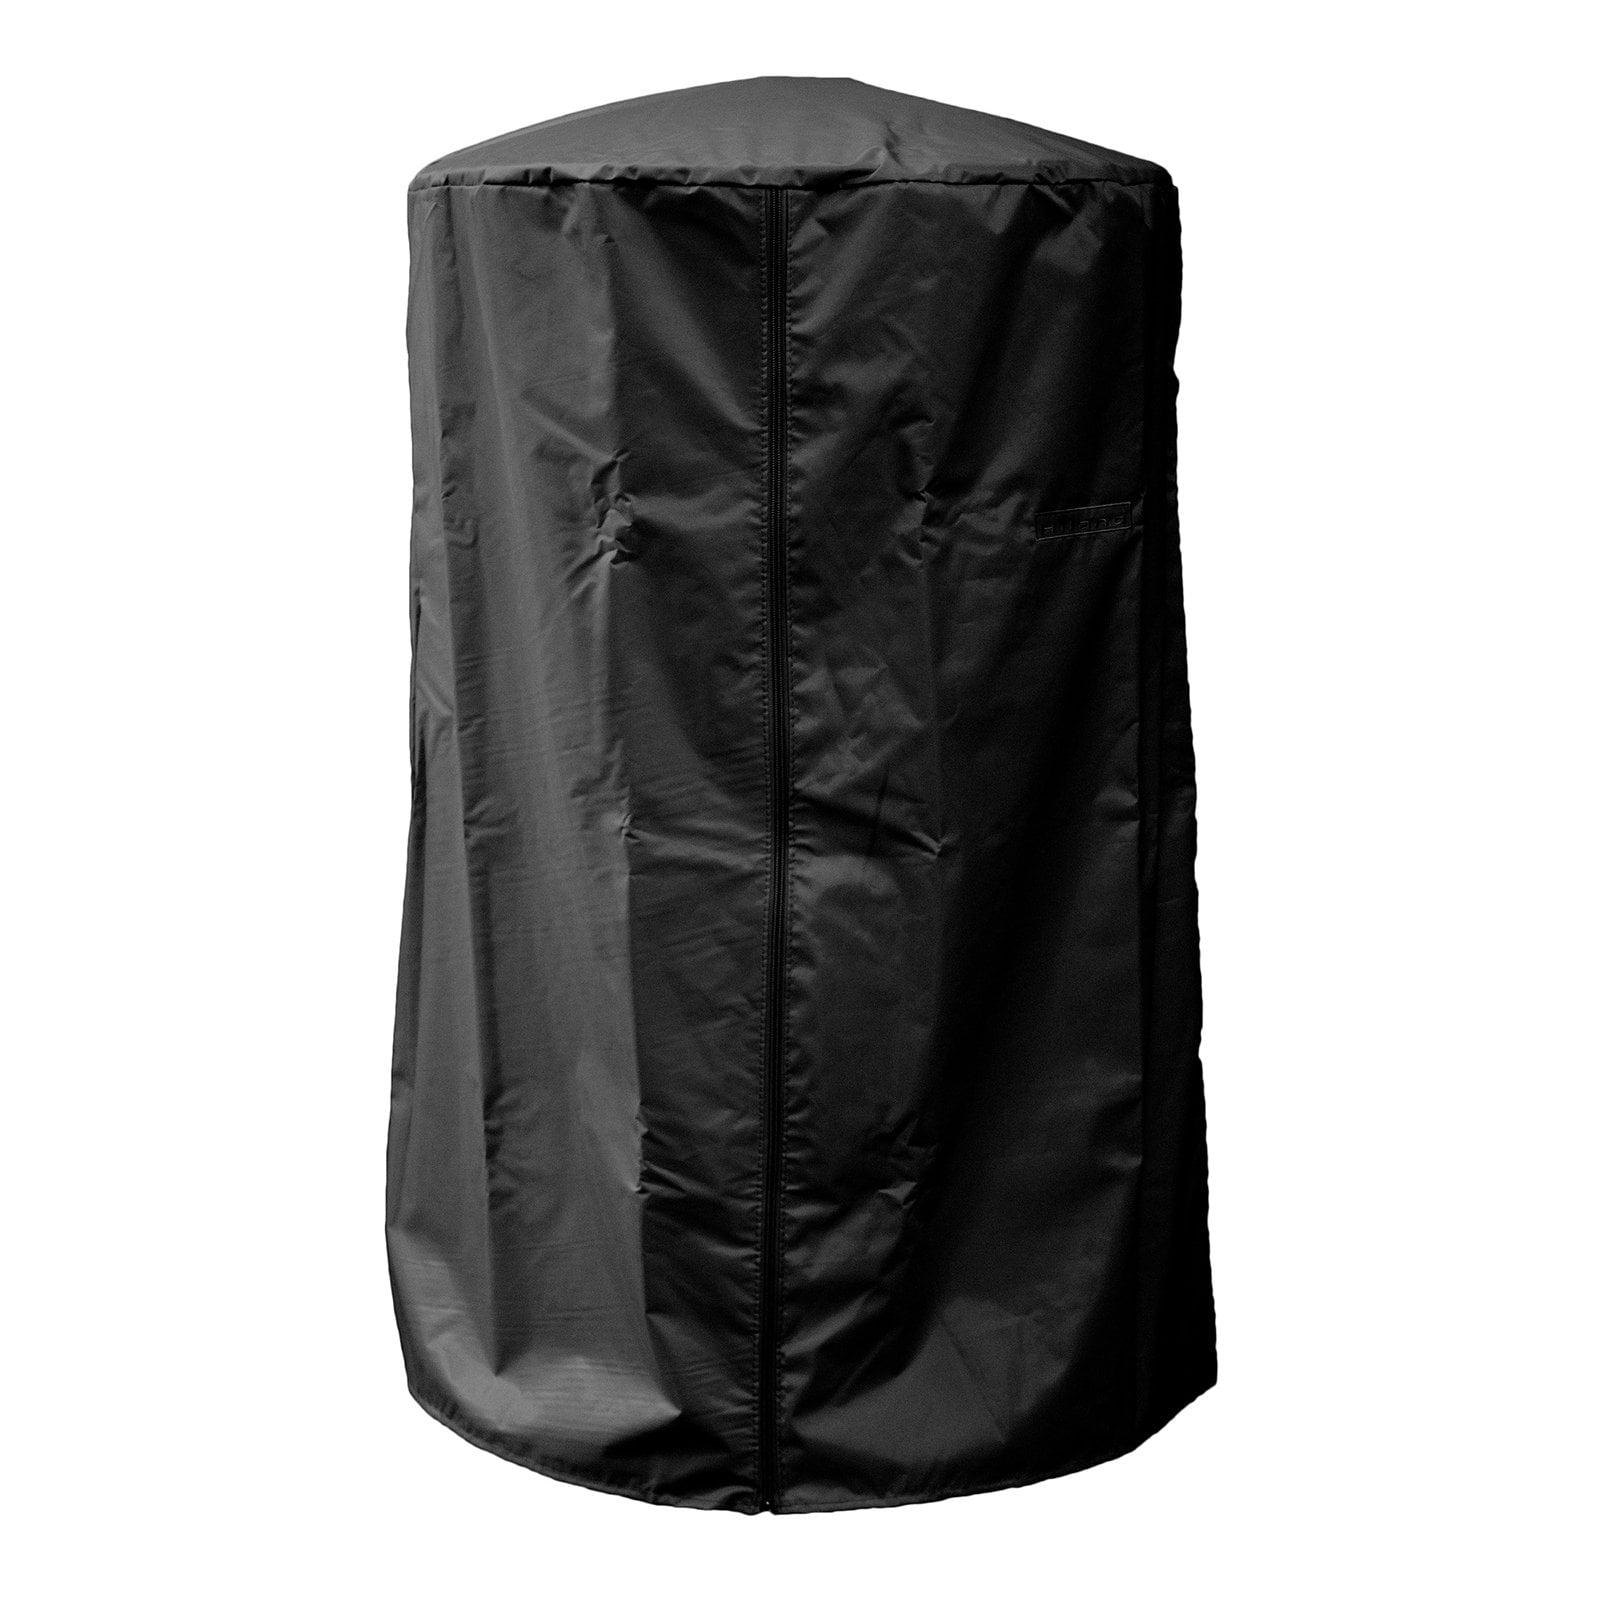 Hiland Heavy-Duty Tabletop Patio Heater Cover, Black